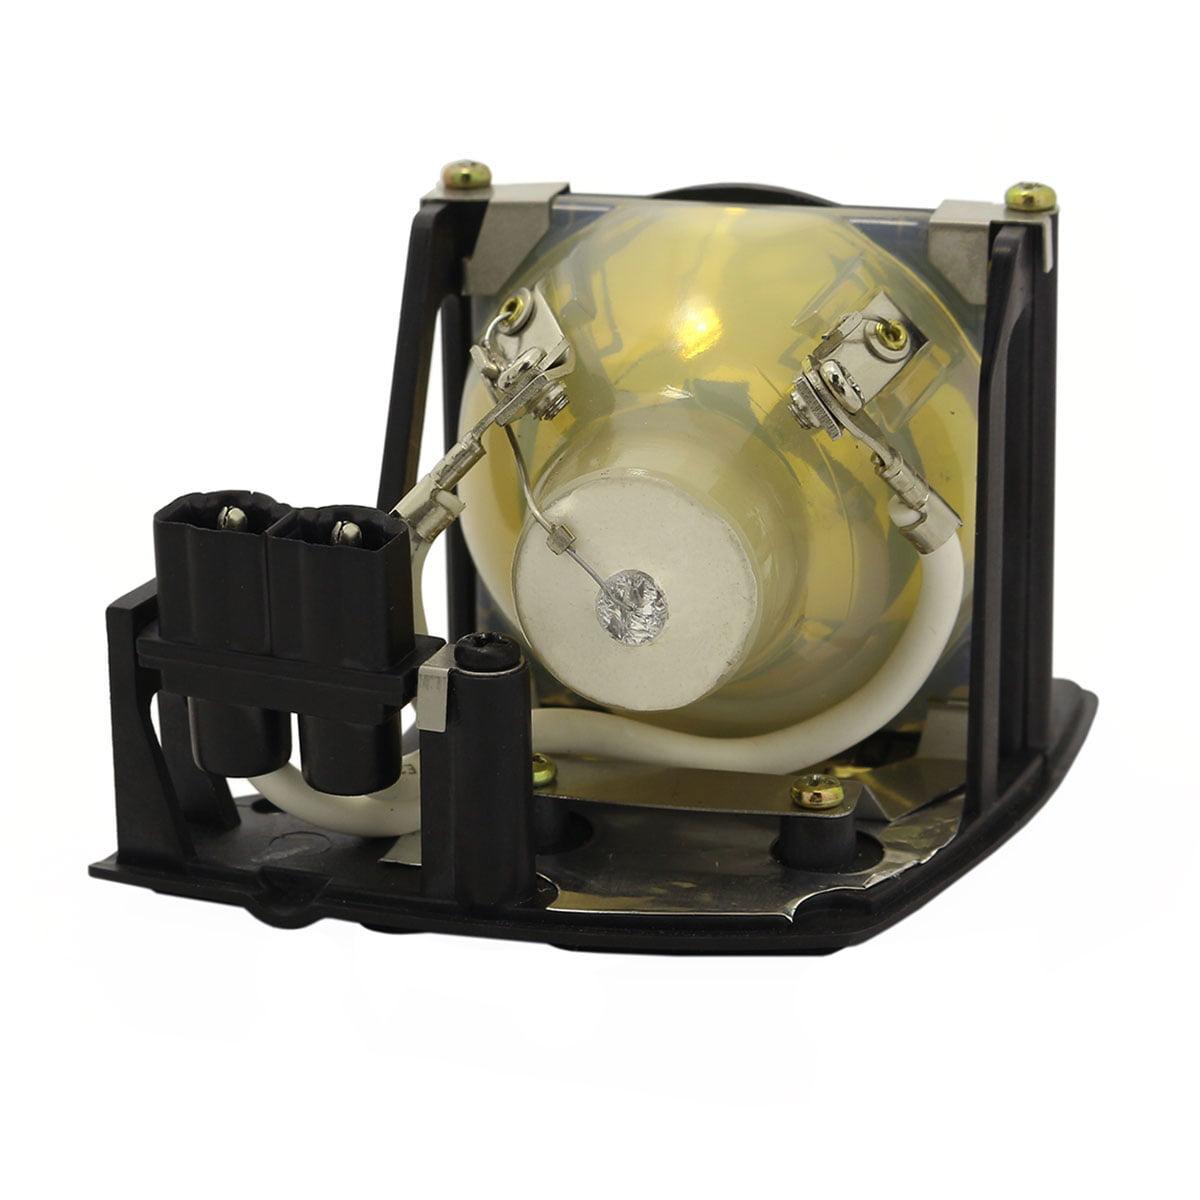 Lutema Economy for Yokogawa LAMP-027 Projector Lamp with Housing - image 2 de 5